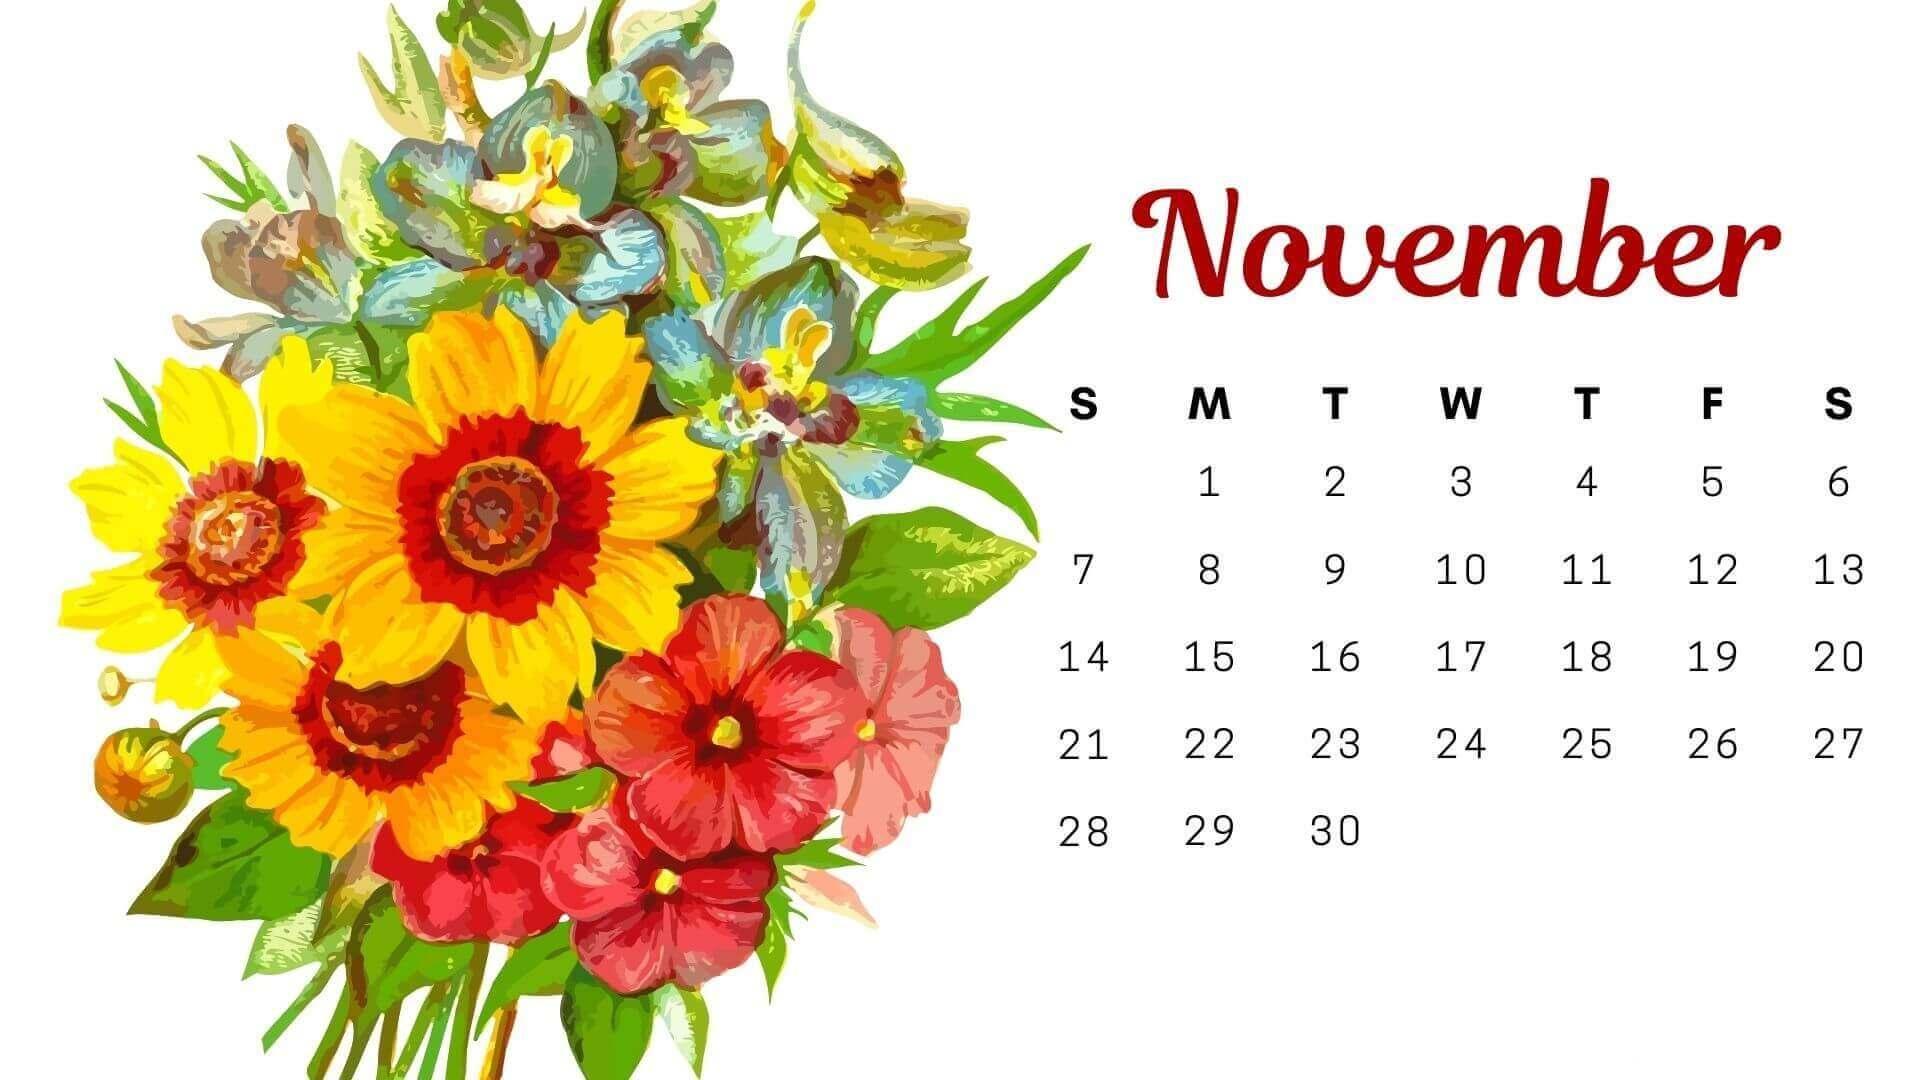 Floral November 2021 Wall Calendar Cute Pink Design Wallpaper